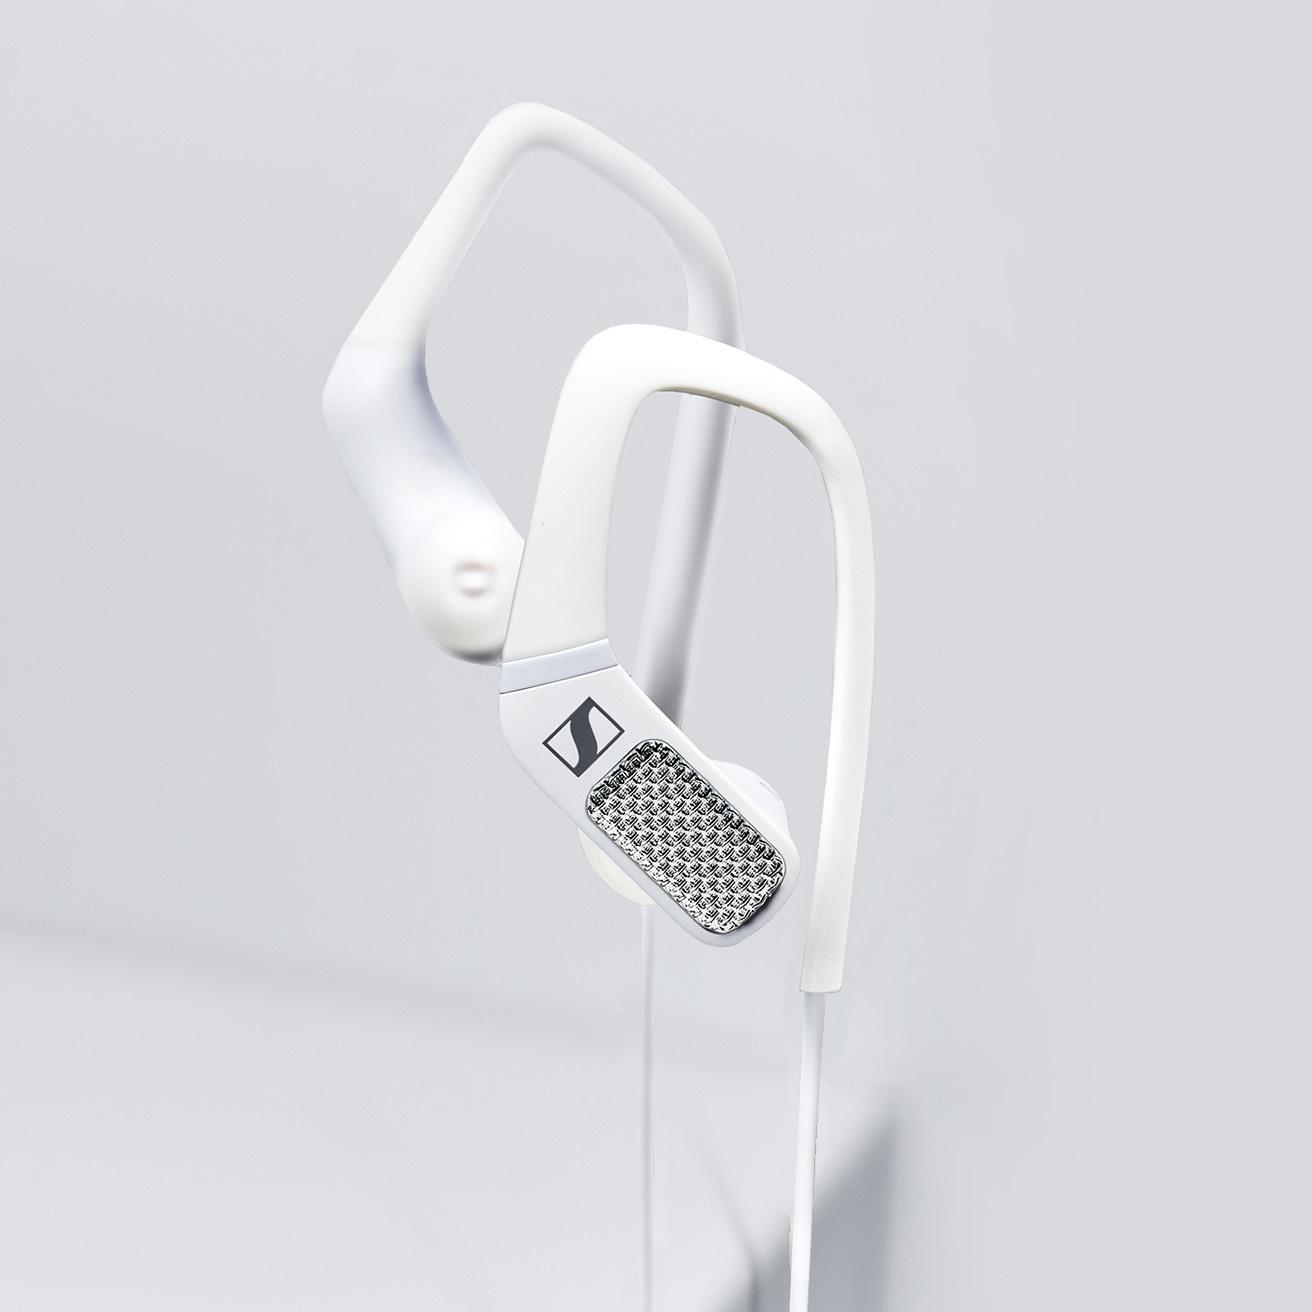 Sennheiser Ambeo Smart Headset Mobile Binaural Recording Headphone Wiring Colors Free Engine Image For User Manual Ear Hook Design